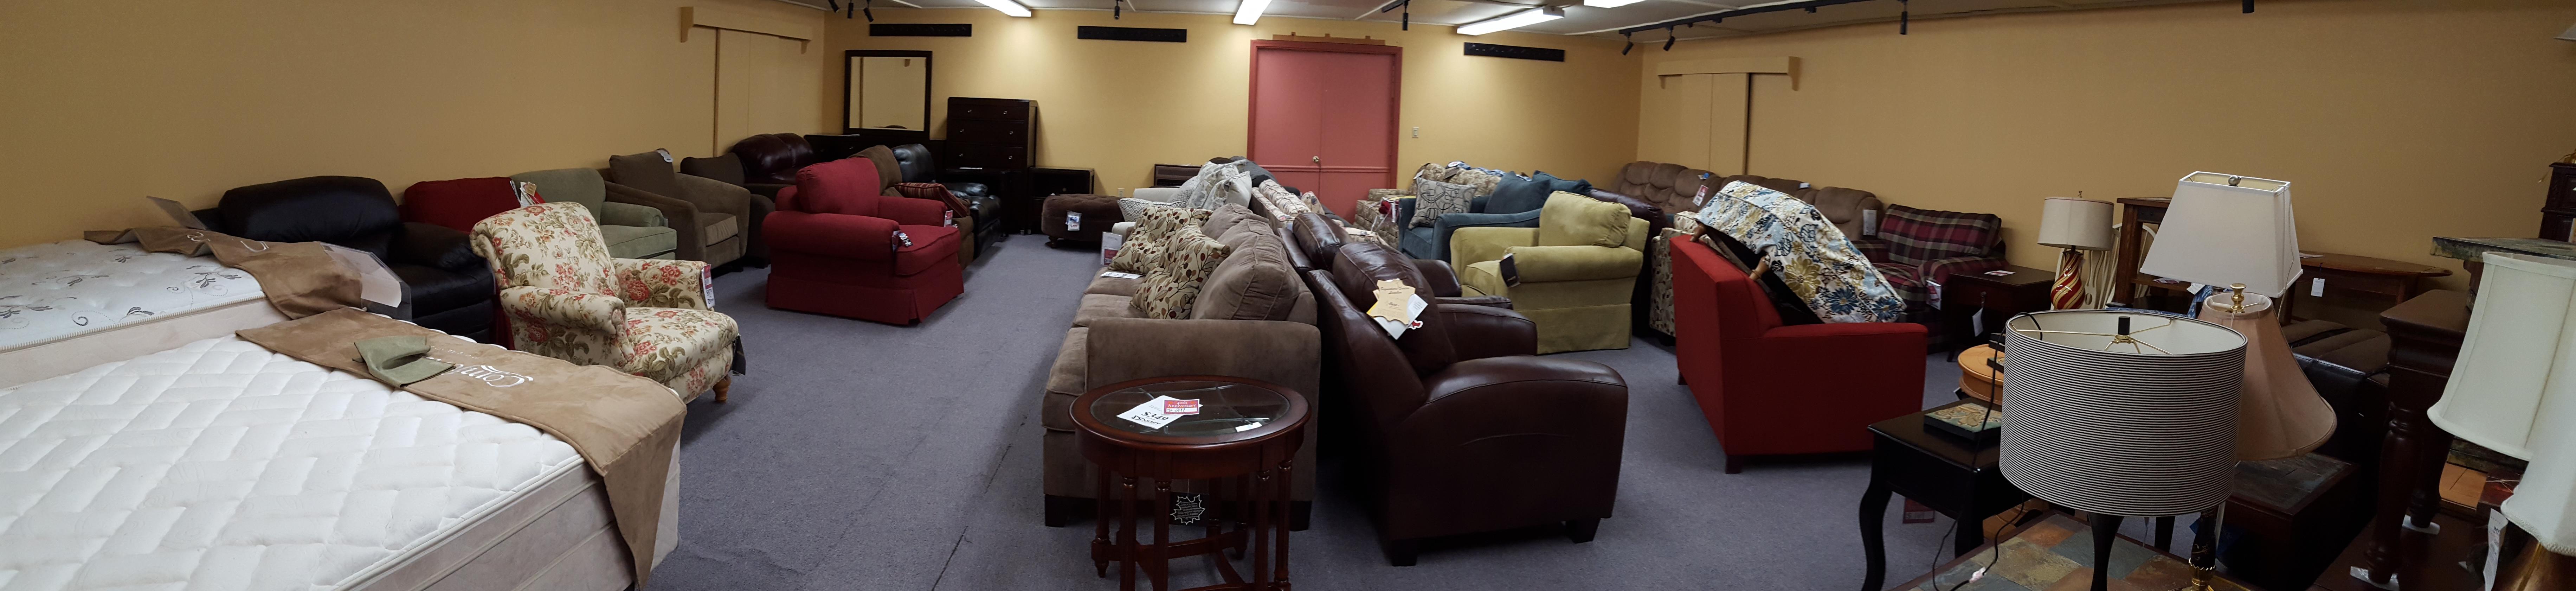 Furniture Store Bangor, Maine, Living Room, Dining Room, Bedroom Sets | Dorsey  Furniture Bangor, Maine